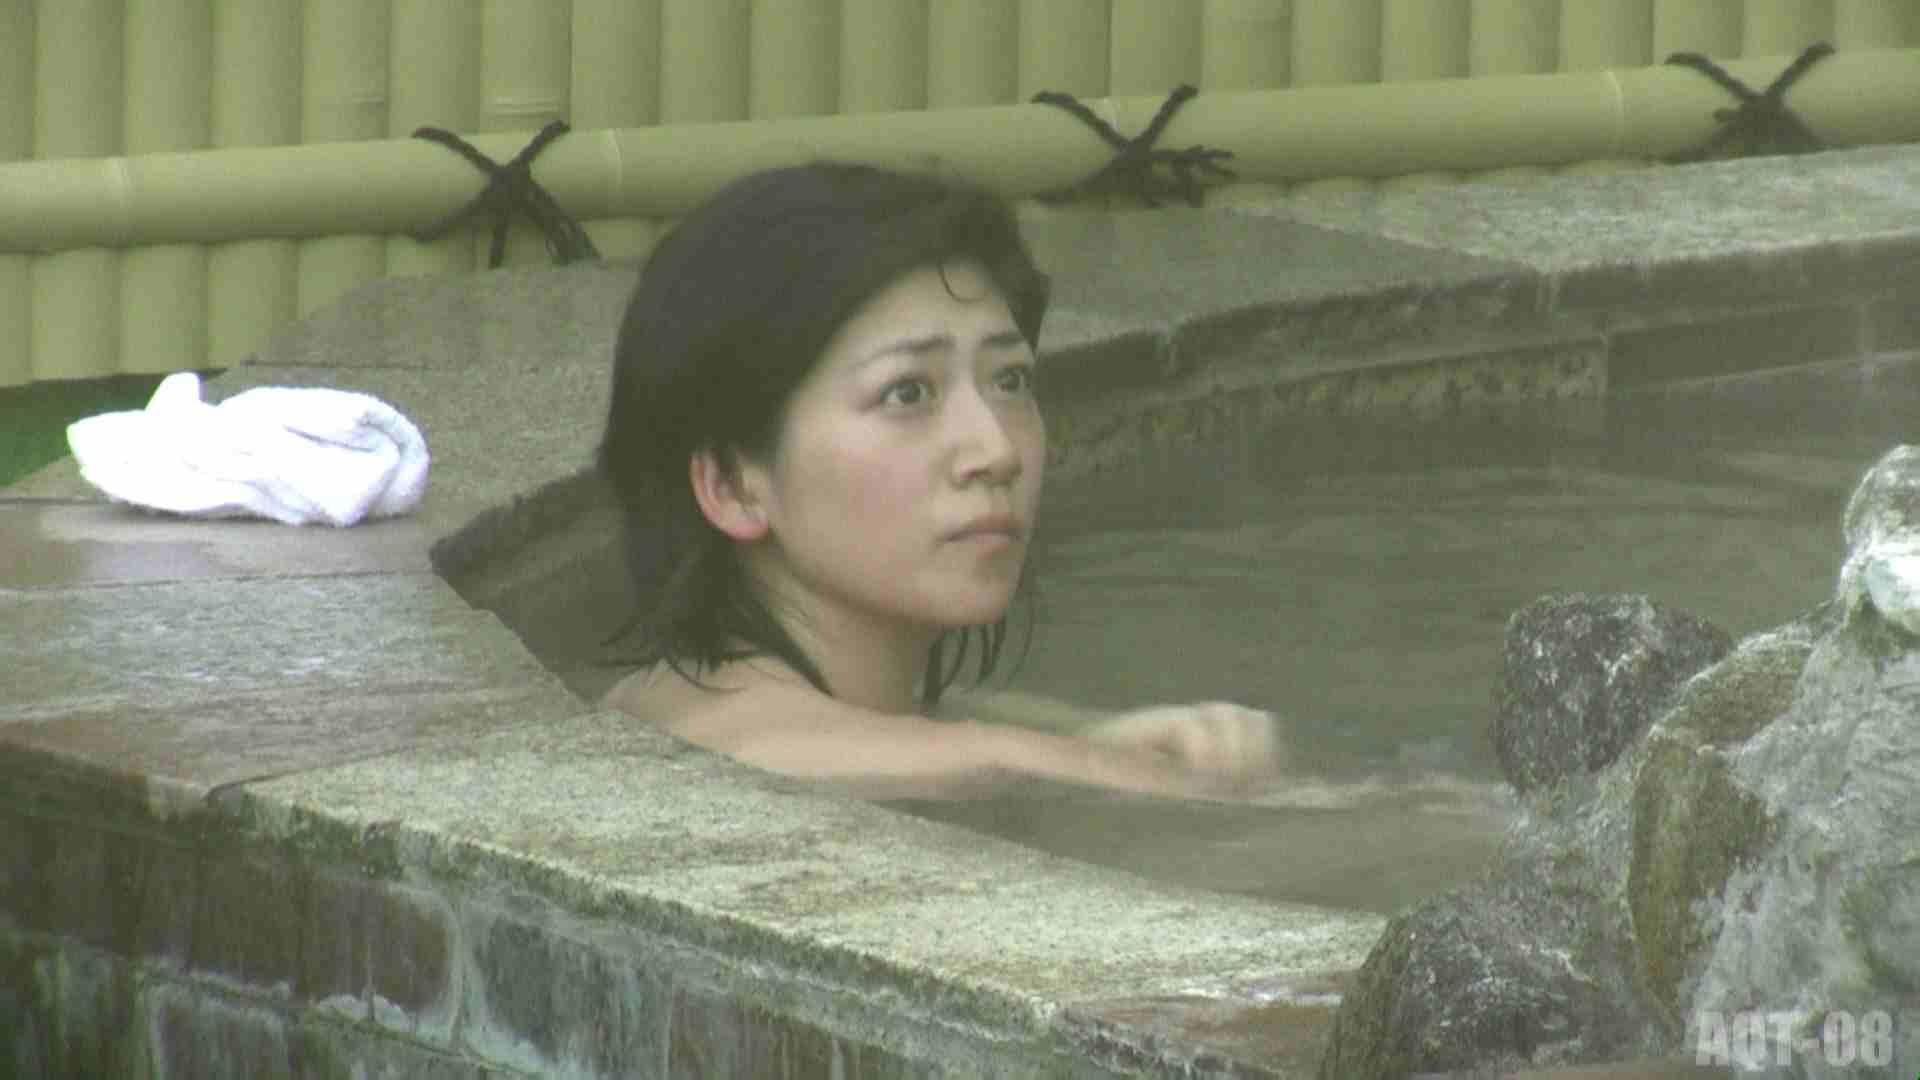 Aquaな露天風呂Vol.776 盗撮 | HなOL  60pic 39